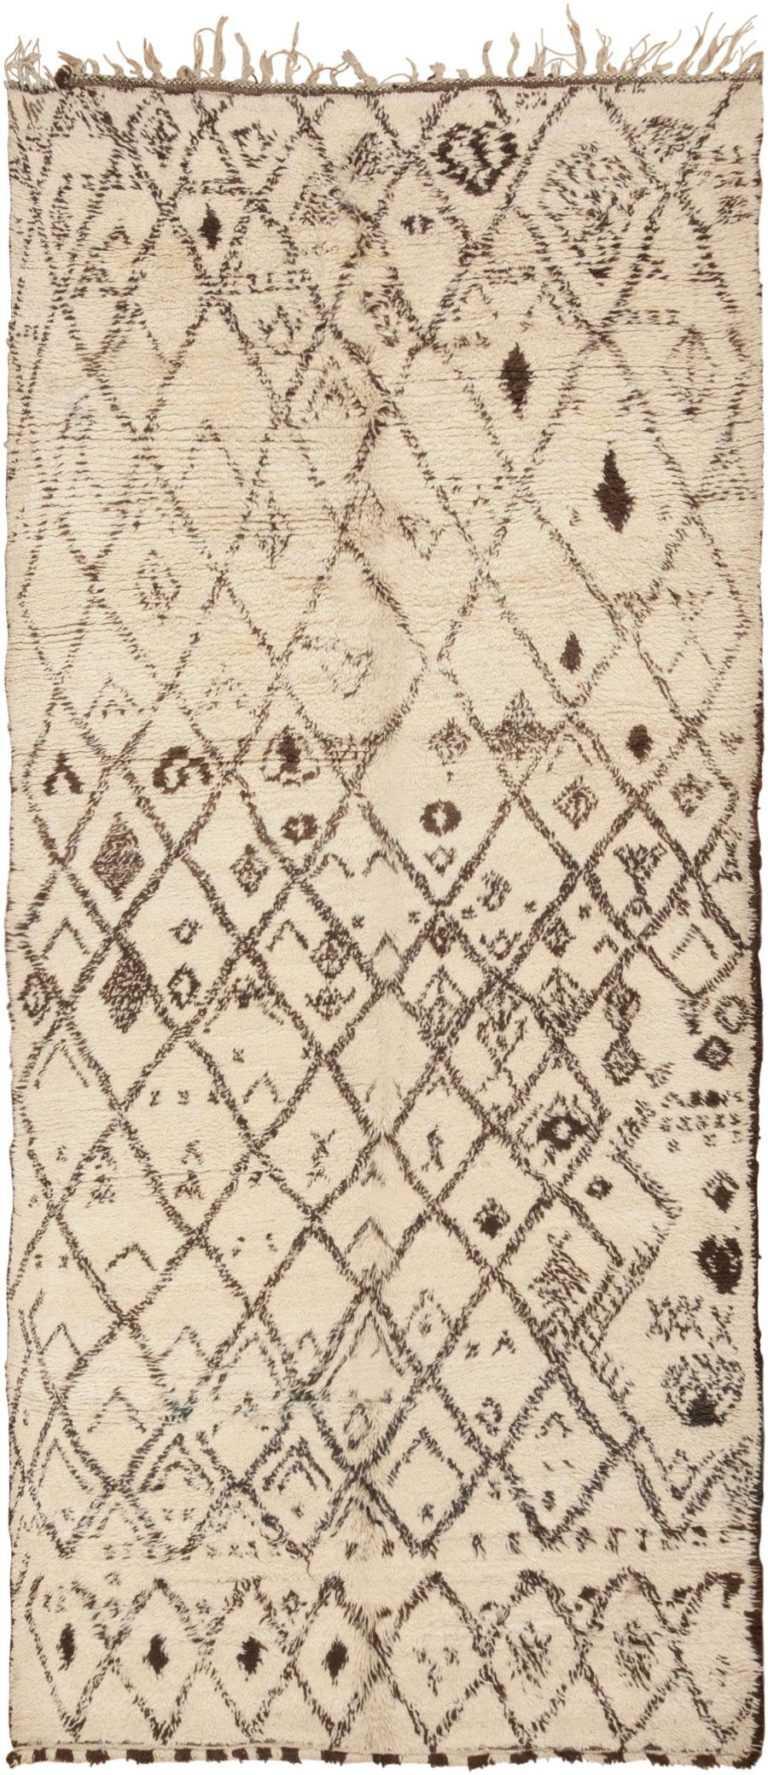 Vintage Moroccan Rug 45848 Detail/Large View